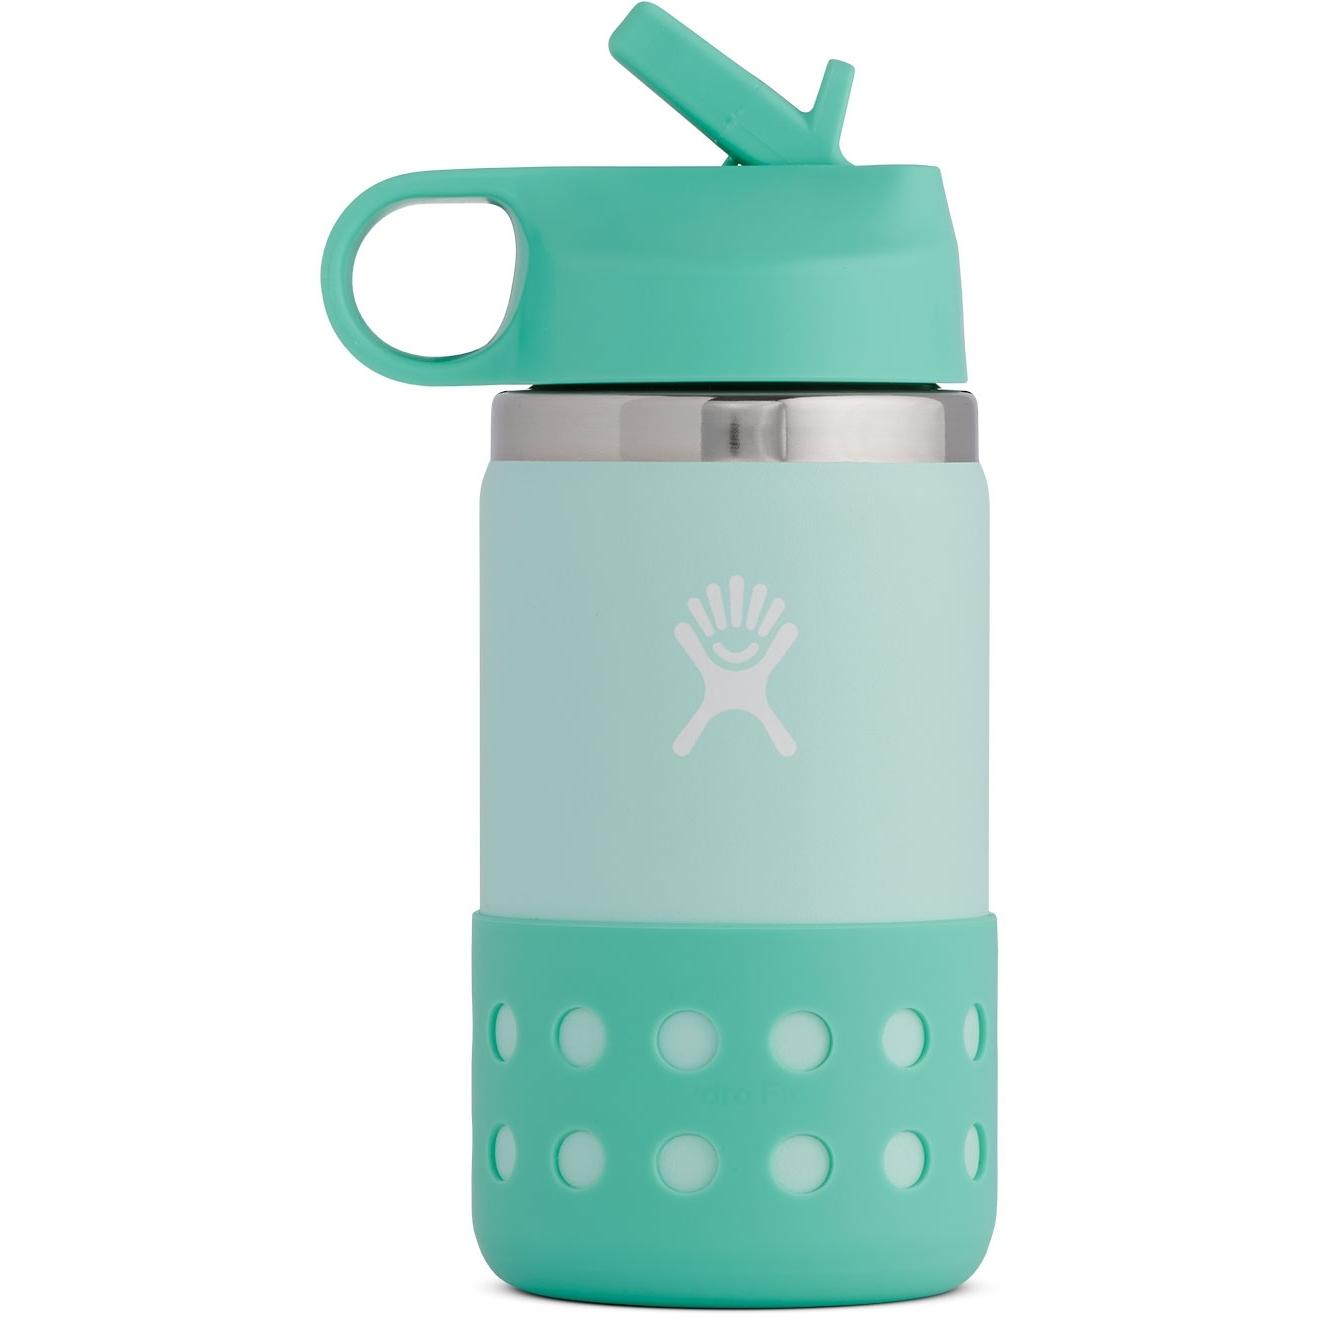 Produktbild von Hydro Flask 12 Oz Kids Wide Mouth Straw Lid & Boot Thermoflasche - 355 ml - Paradise